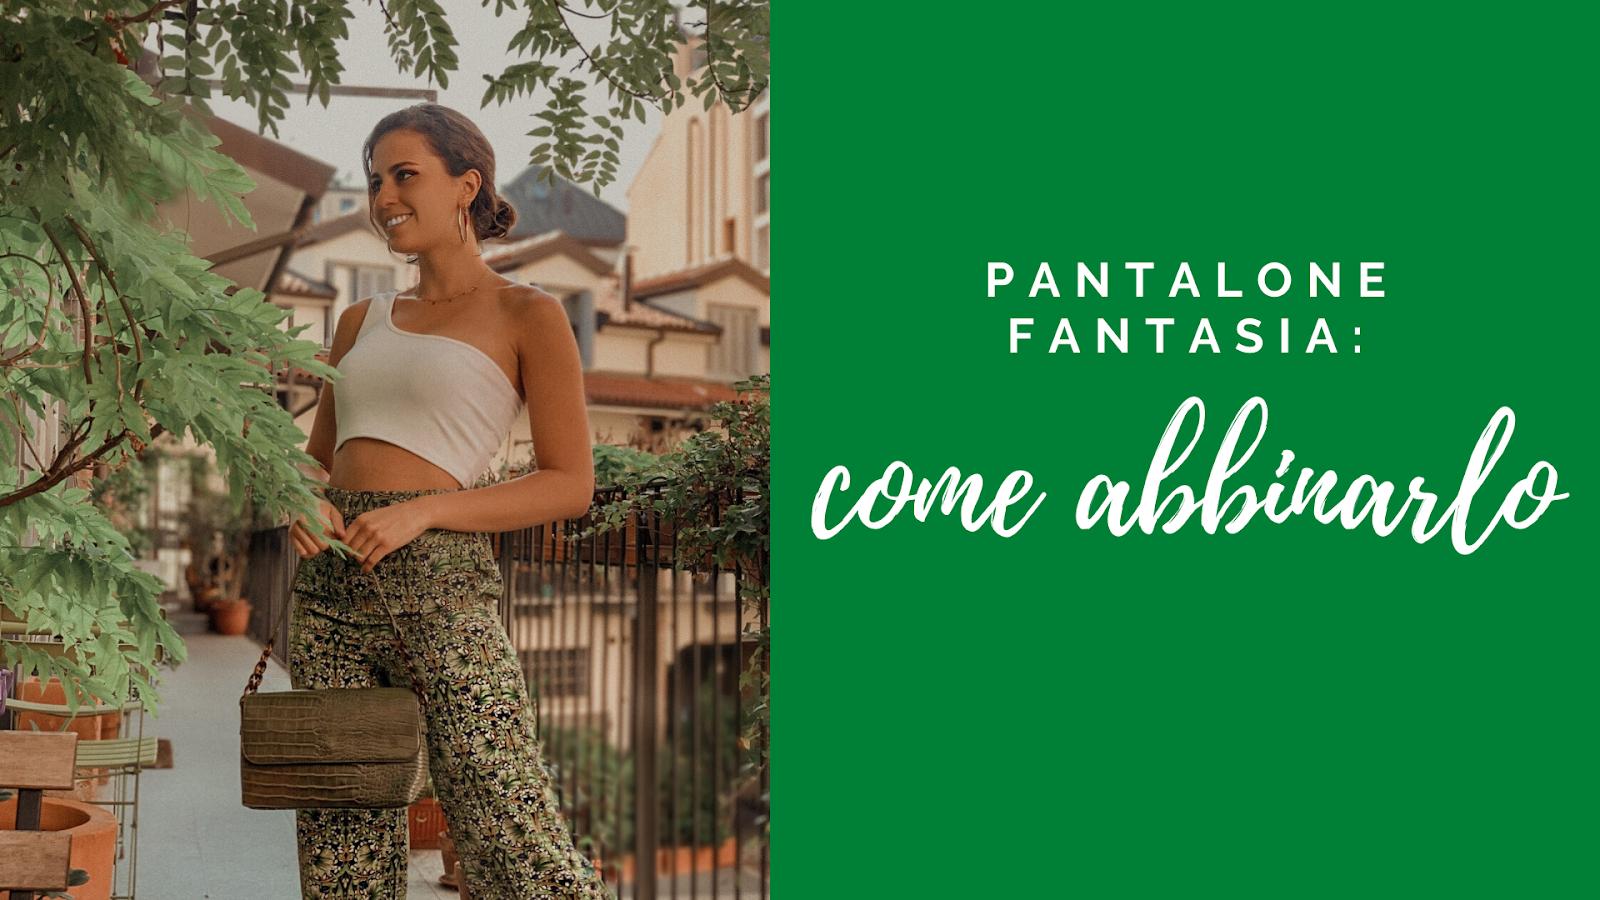 pantalone fantasia: come abbinarlo, Valentina Rago, fashion need, fashion blog milano, come abbinare pantaloni stampa, pantaloni fantasia donna